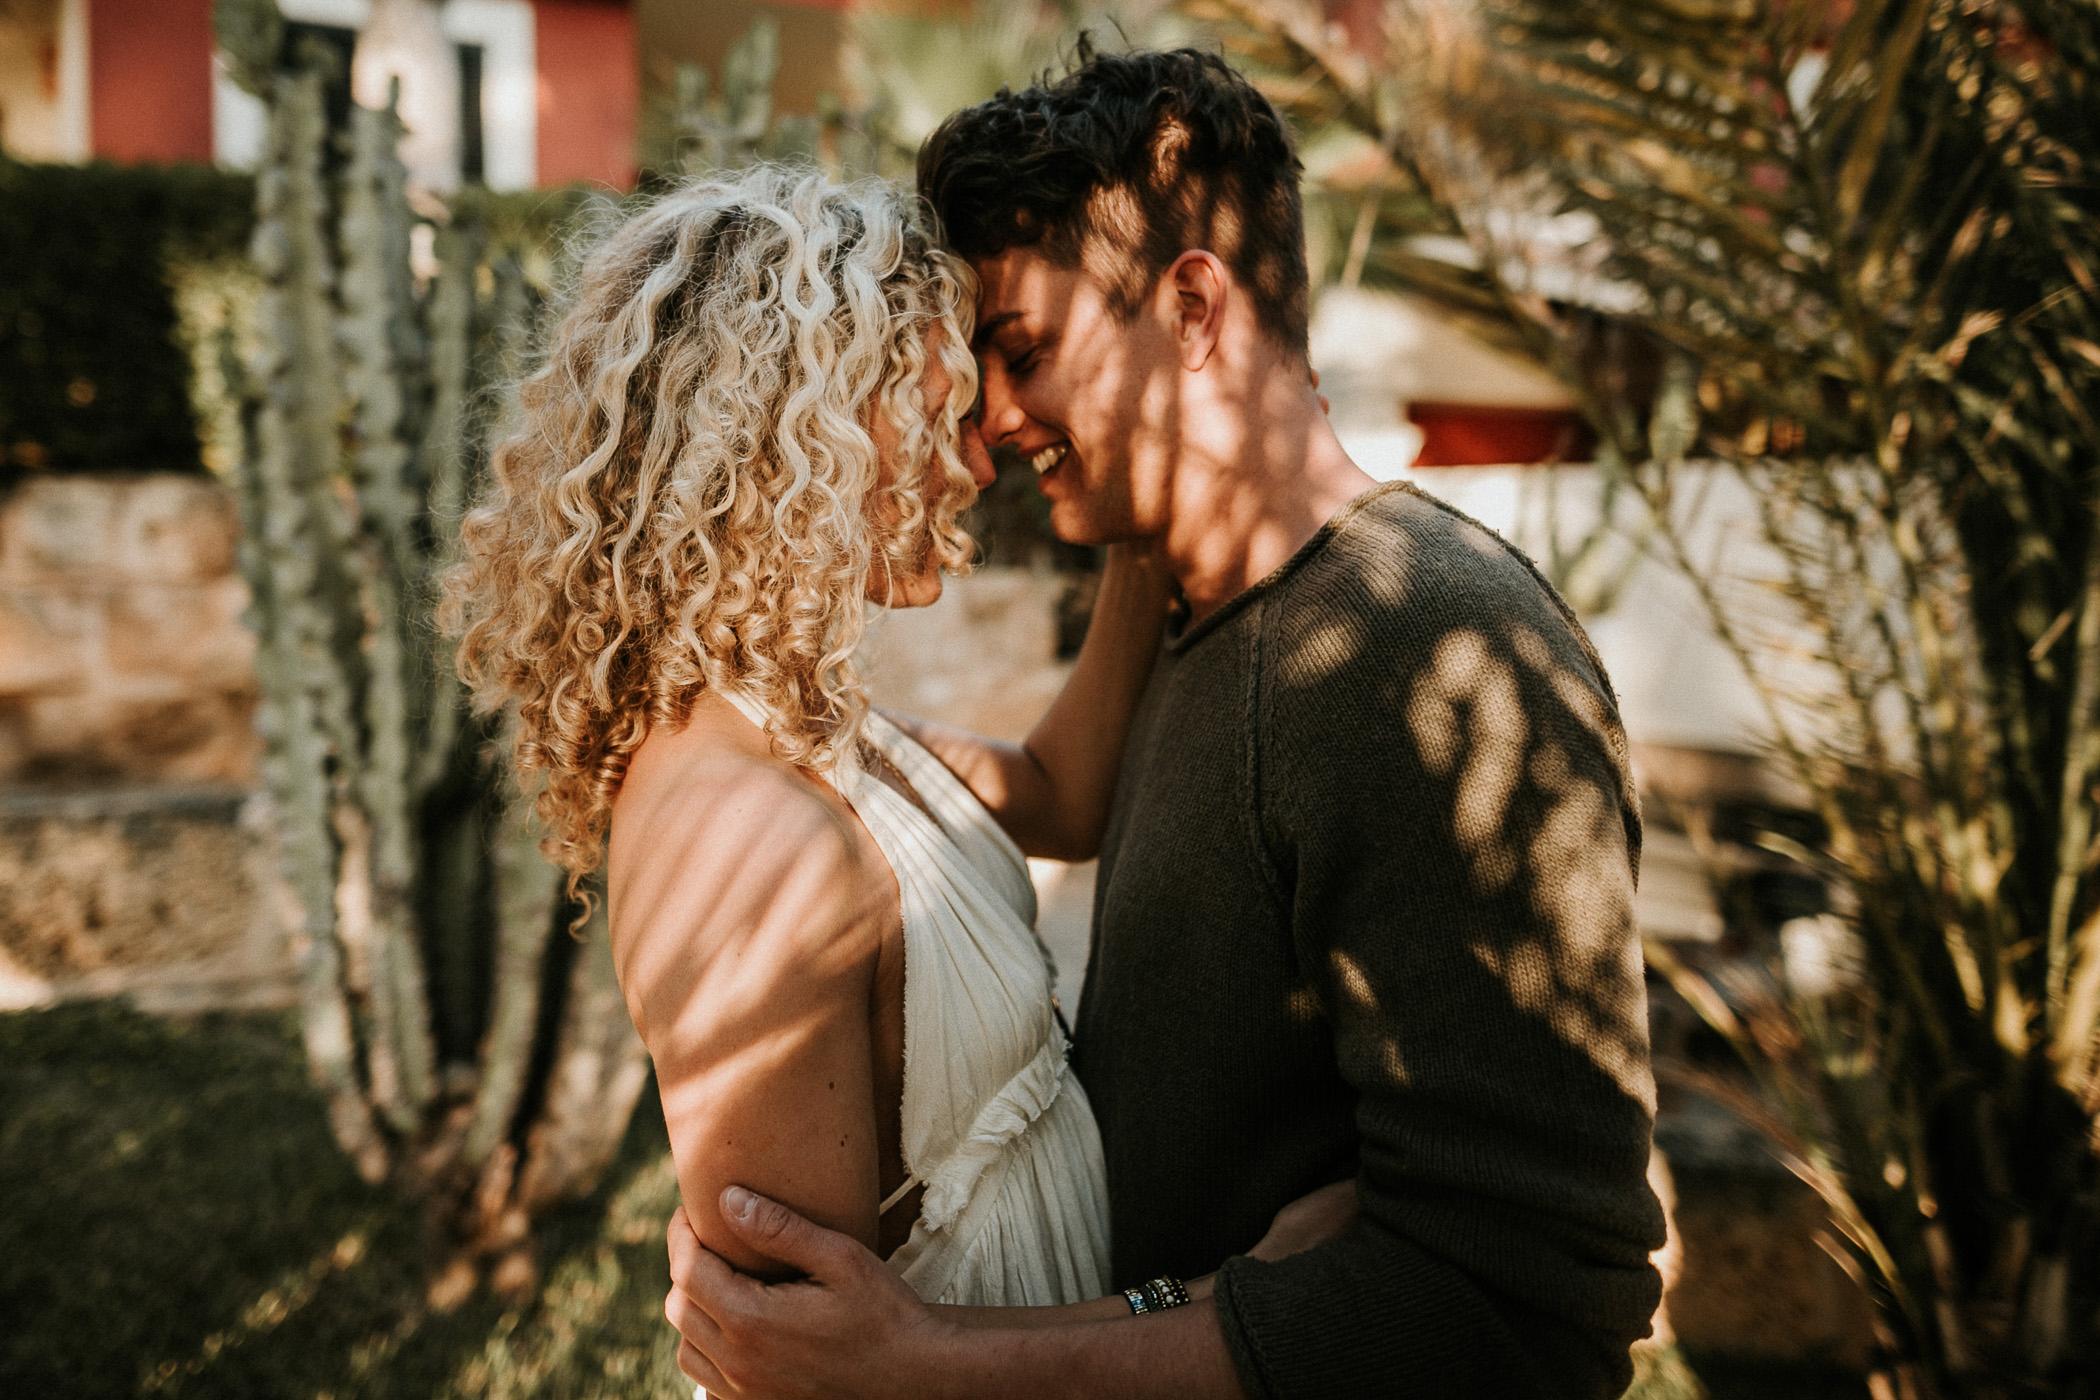 DanielaMarquardtPhotography_elopement_mallorca_spain_paguera_palma_charlyandbela_66